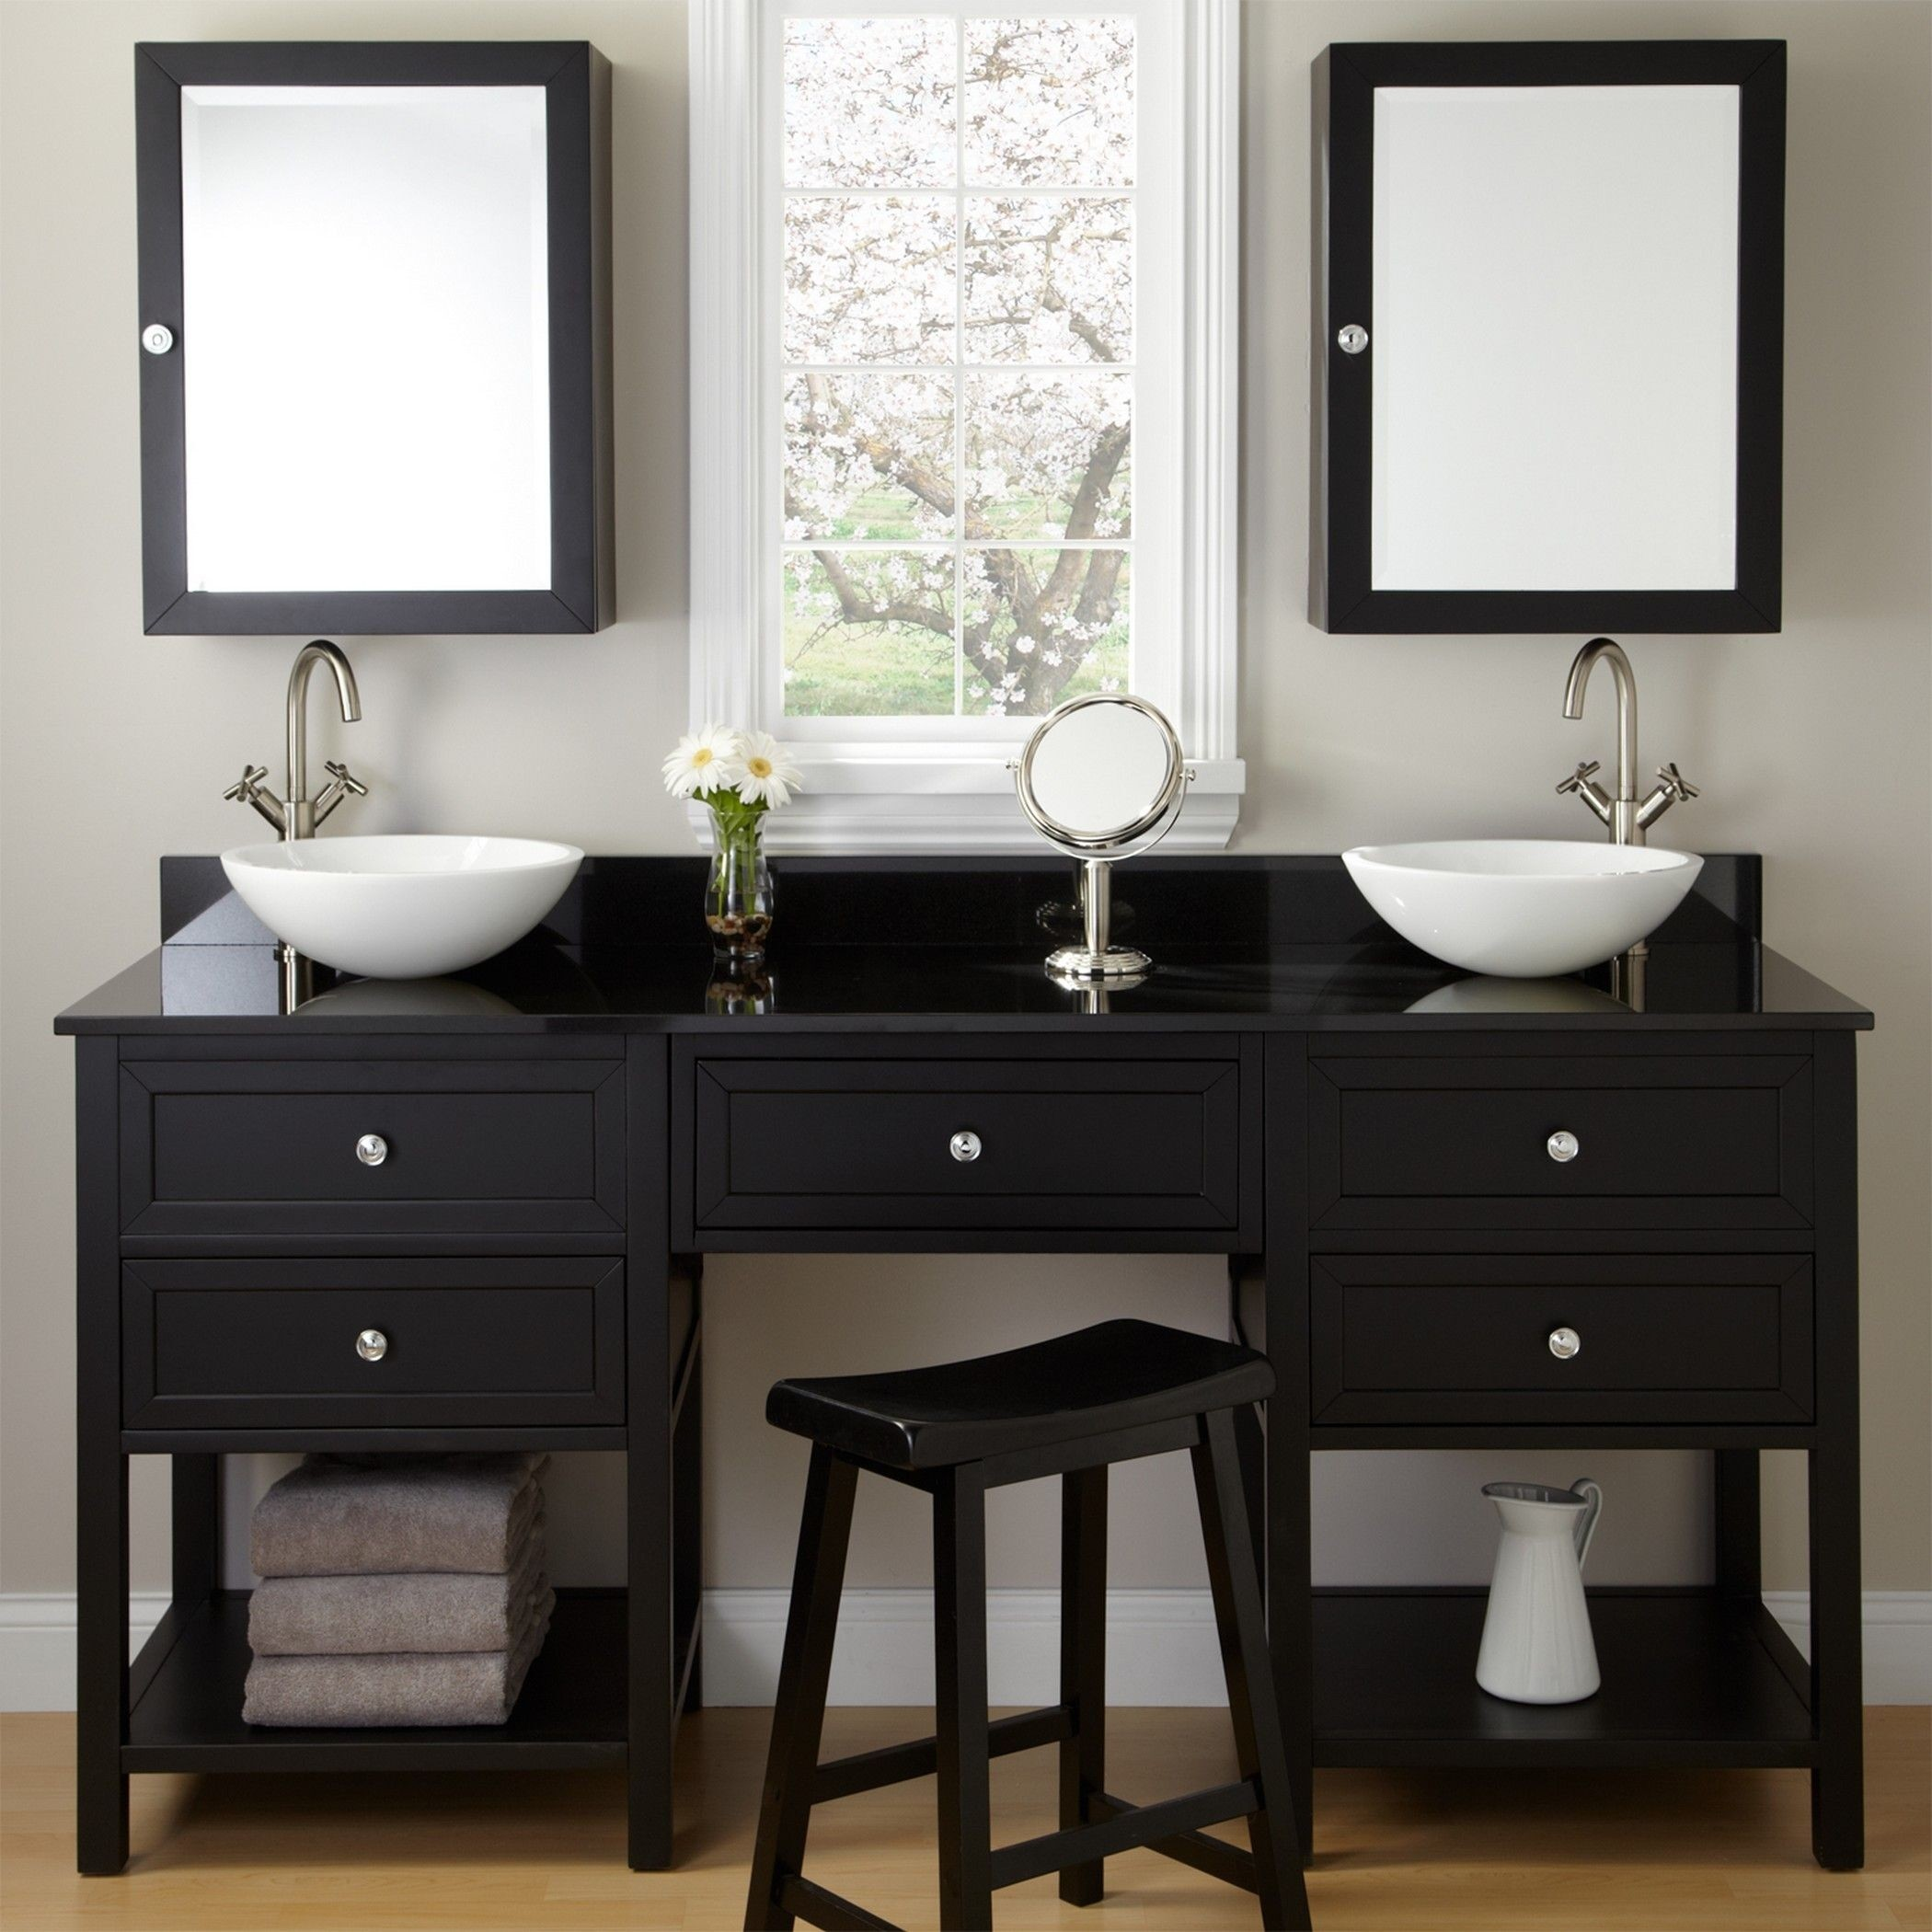 How To Choose A Bathroom Vanity Foter